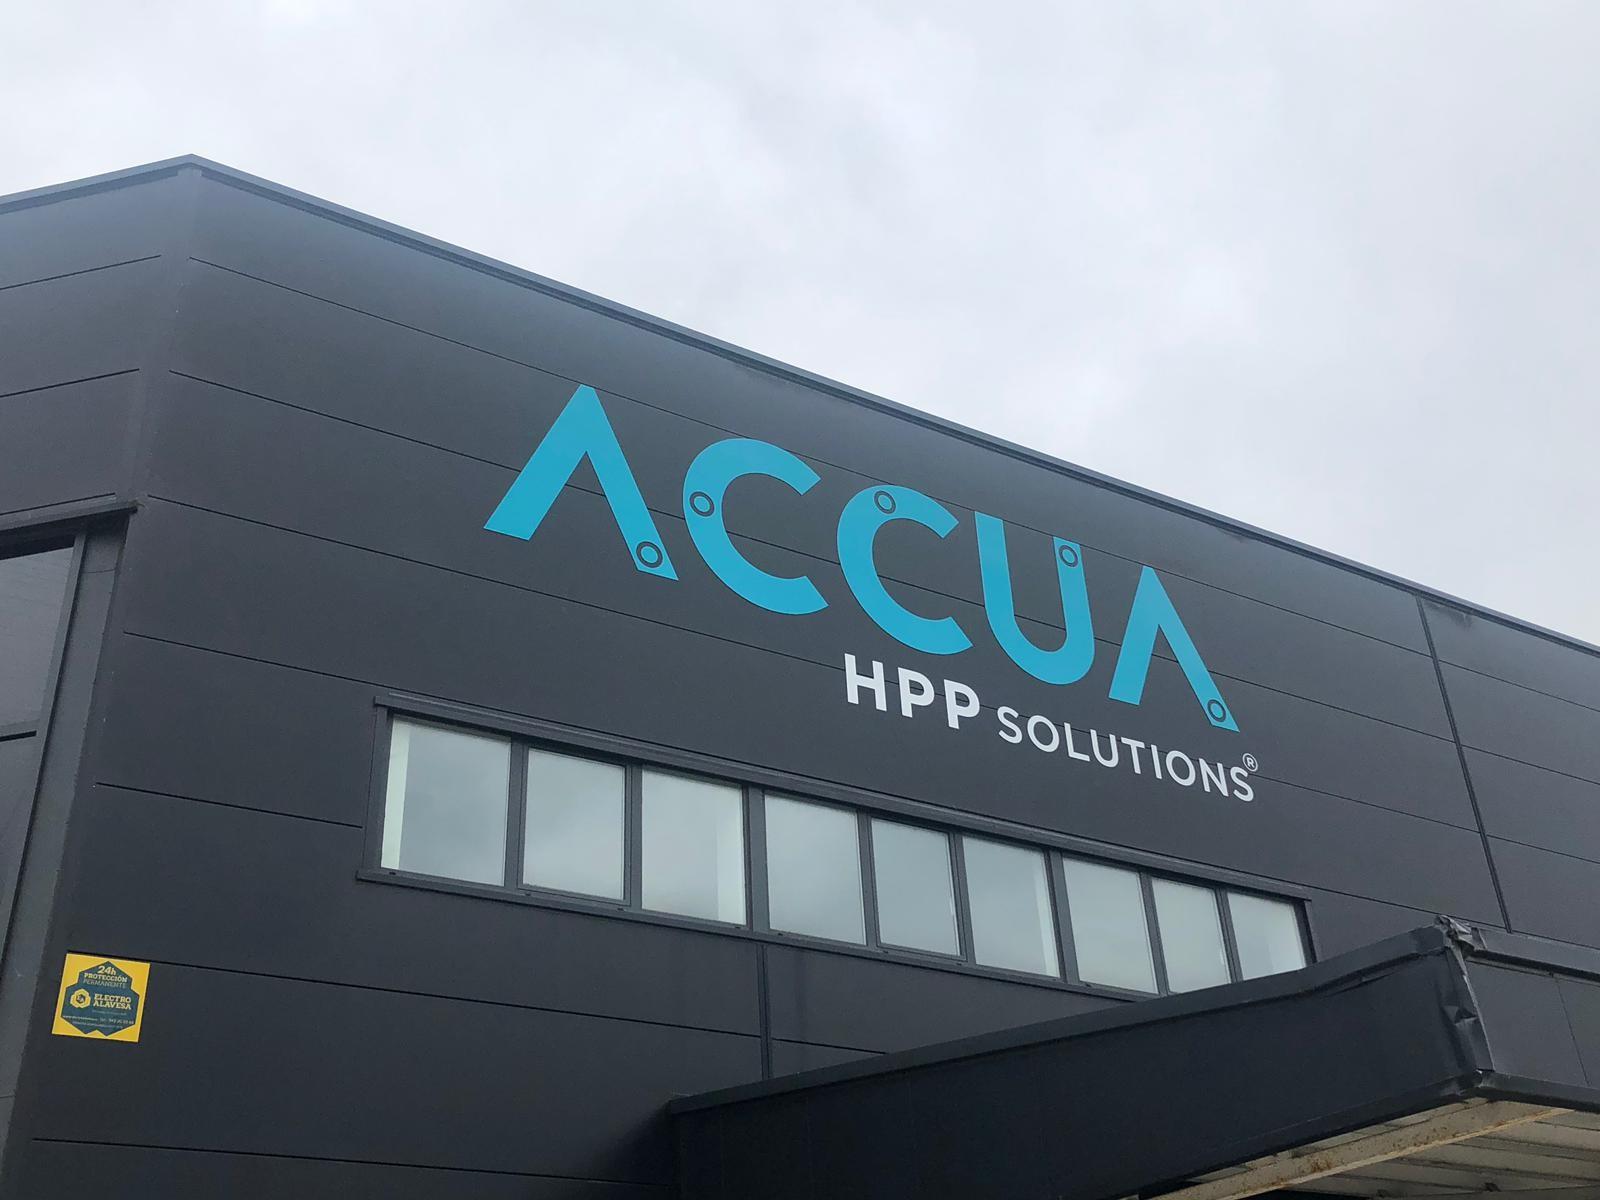 Accua_Hpp_Solutions5.jpg